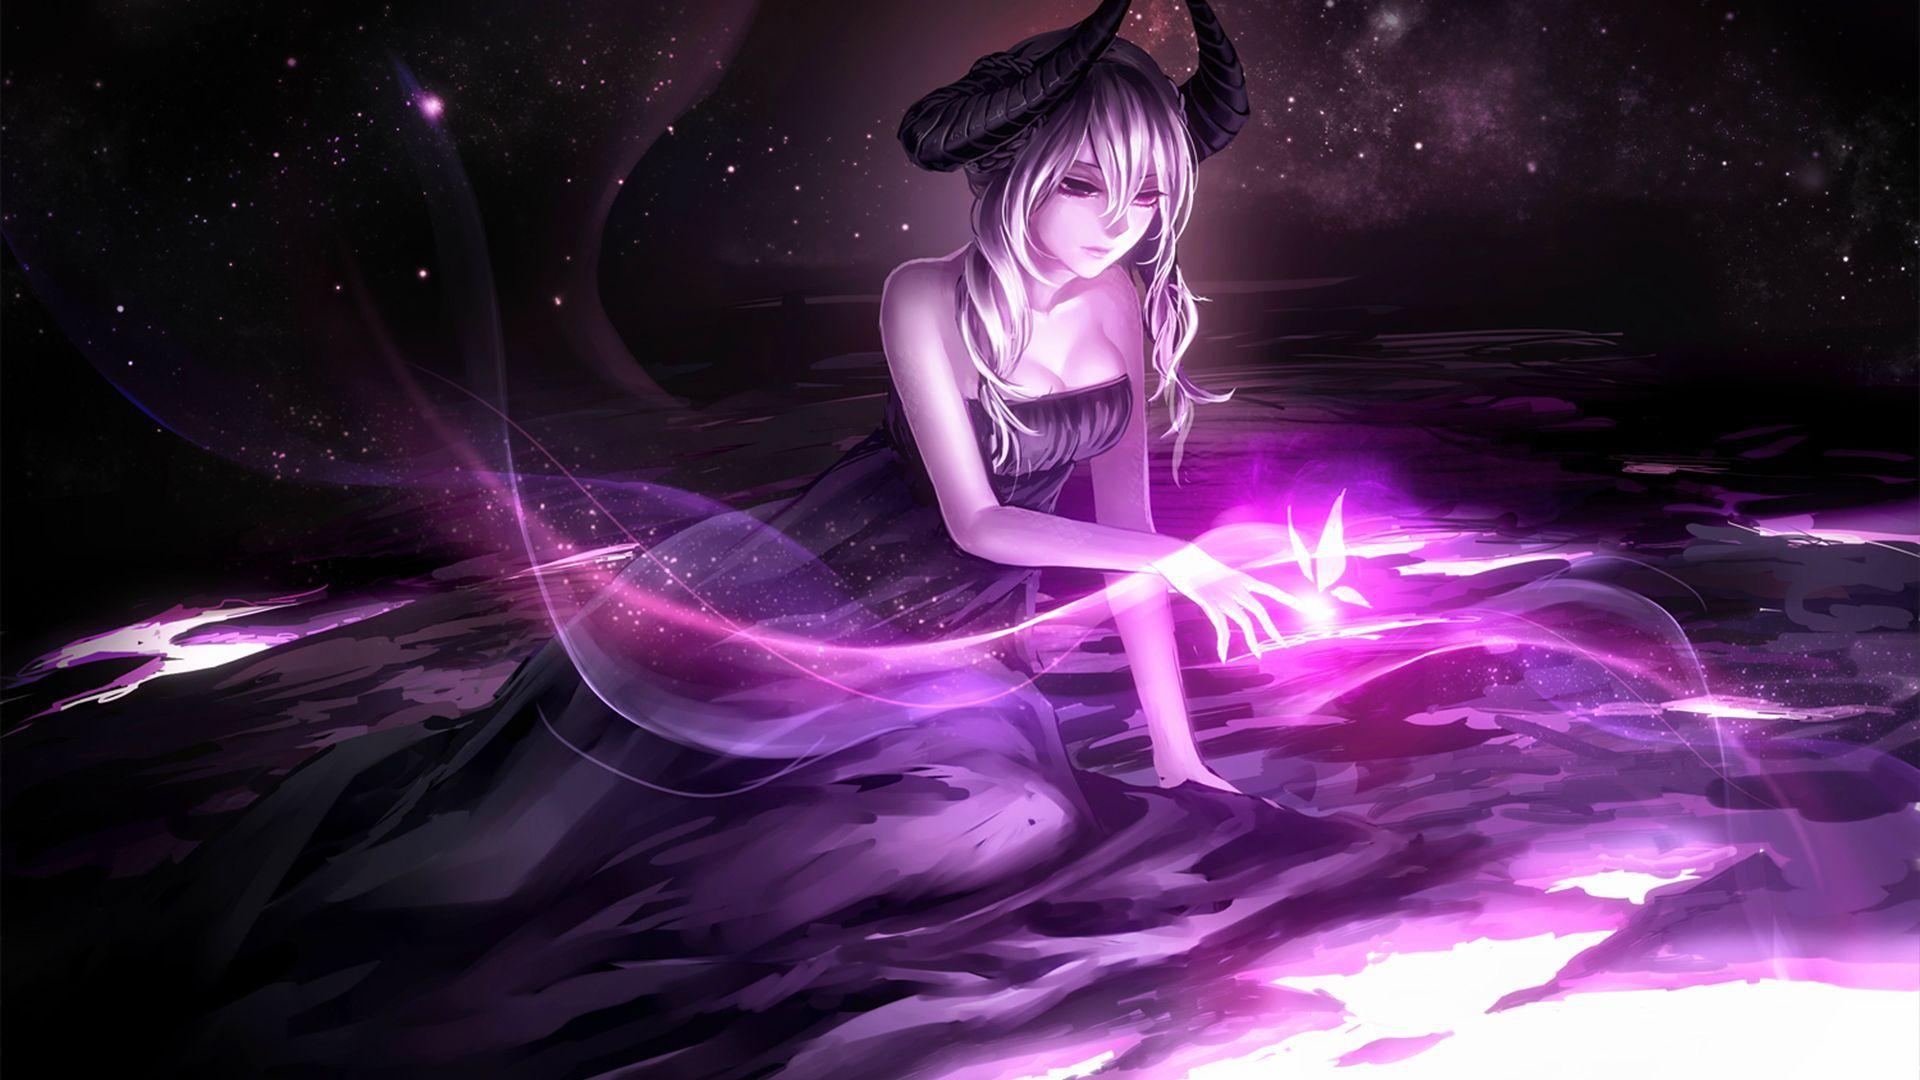 Pin By Dolly Hickman On Anime In 2020 Anime Art Dark Anime Demon Girl